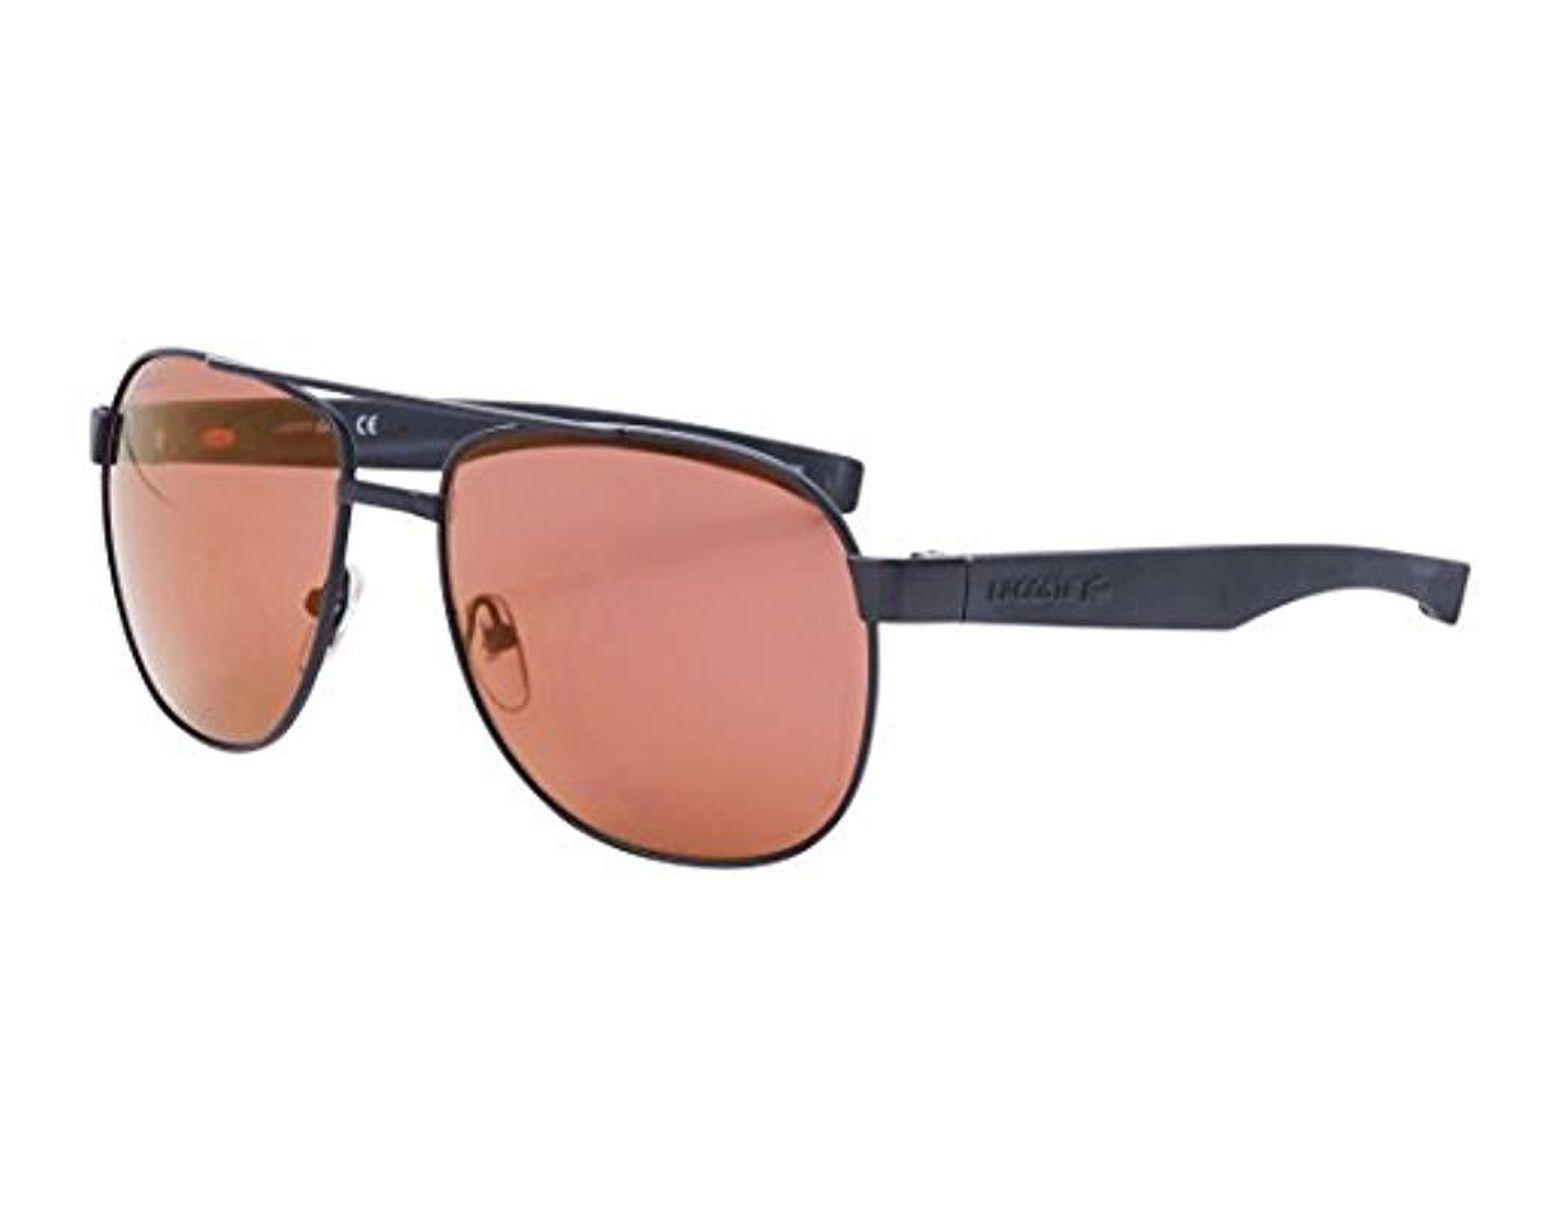 1a6b3e3a938db Men's Black L186s Aviator Sunglasses